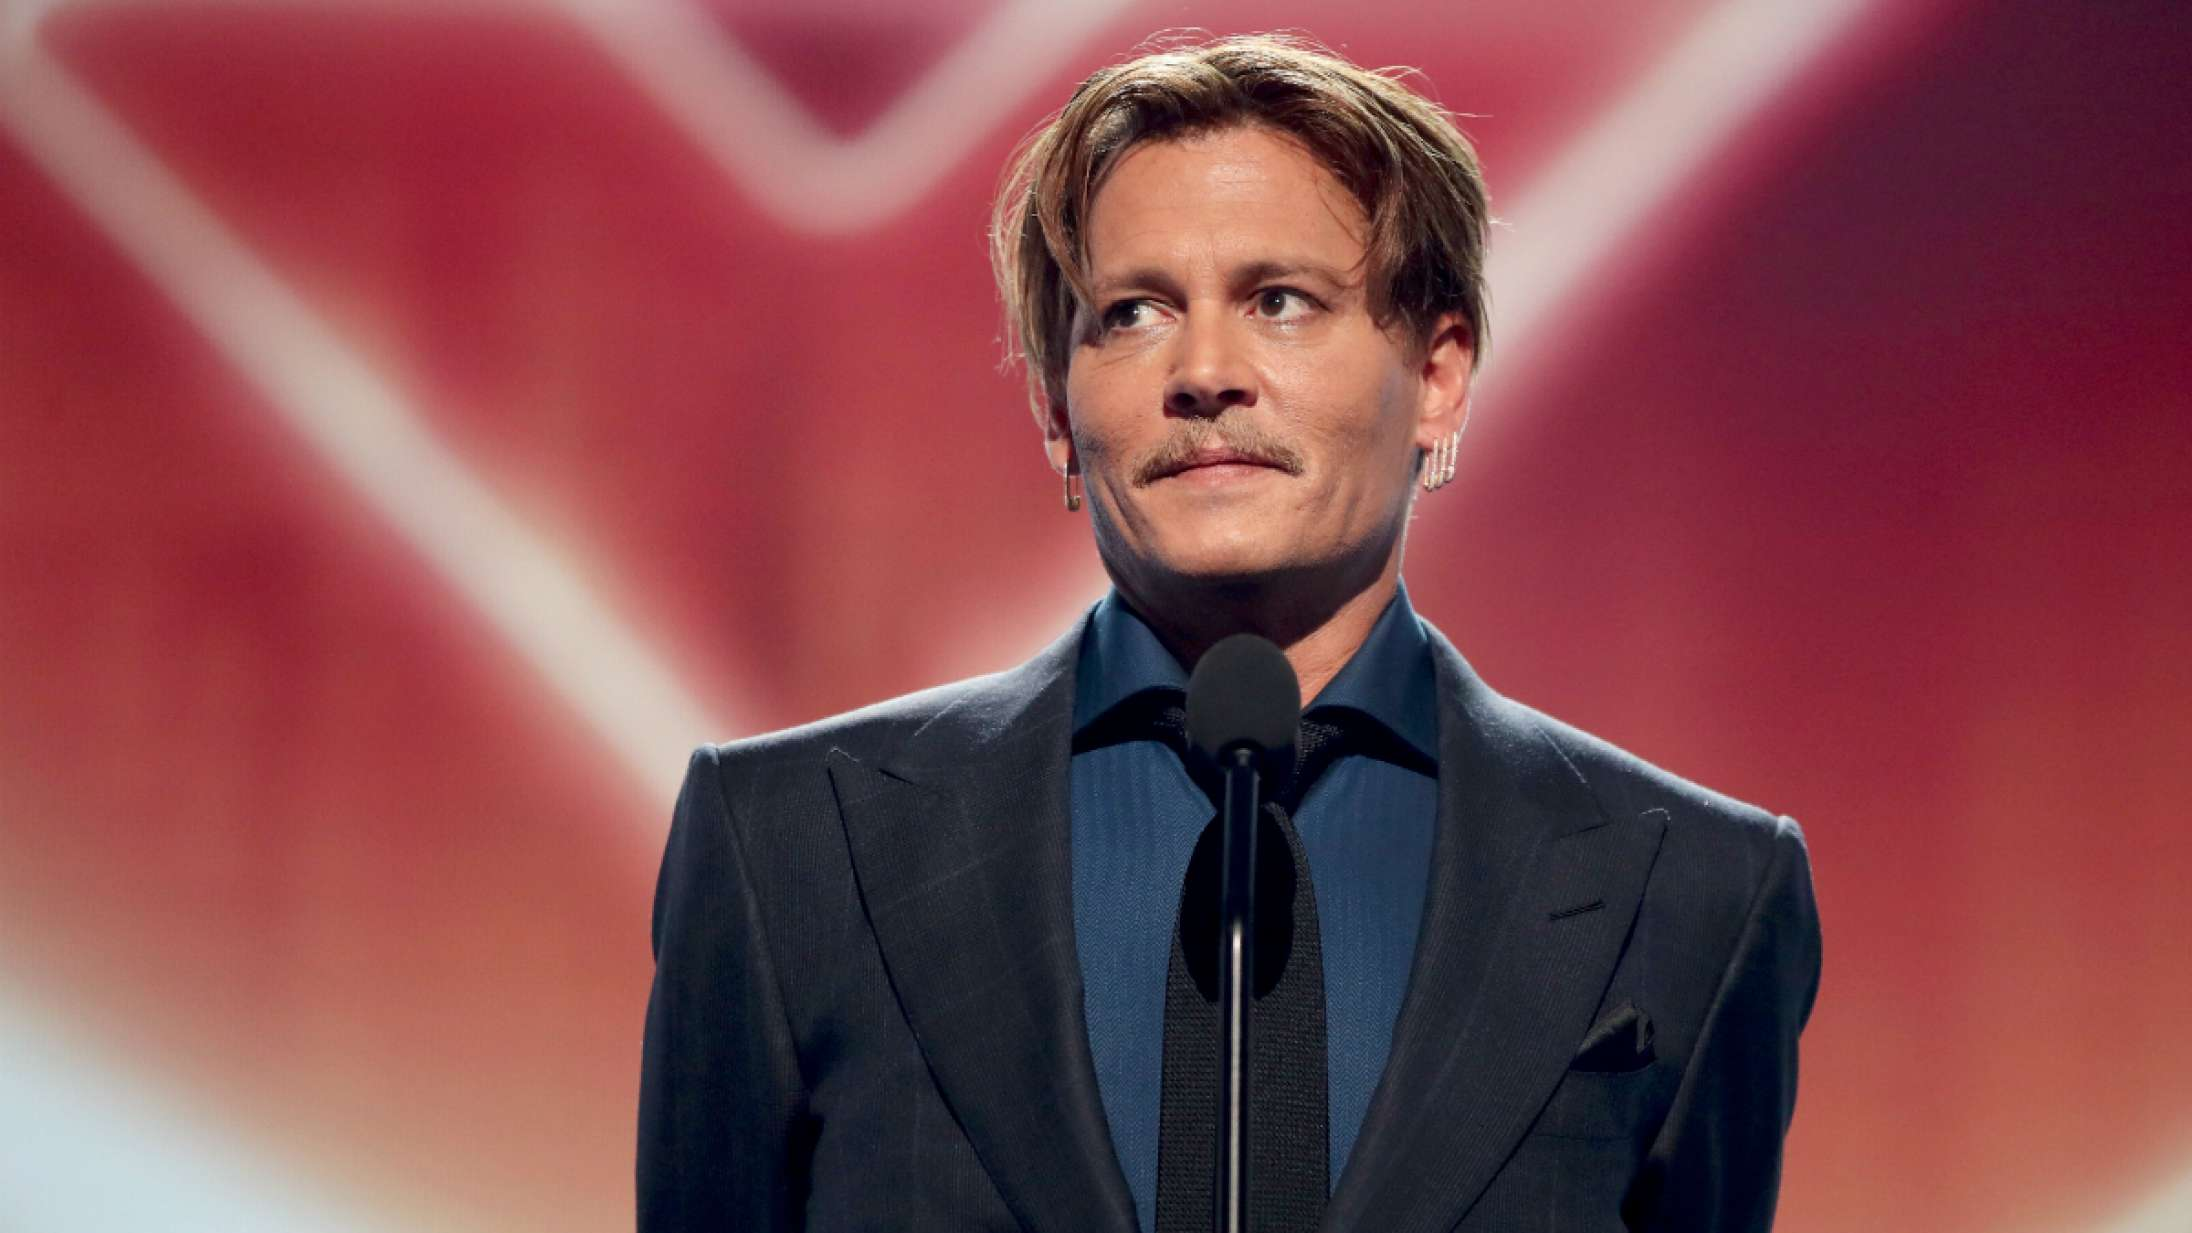 Johnny Depp producerer bizart musicalstykke om Michael Jackson – fortalt fra popkongens handskes perspektiv